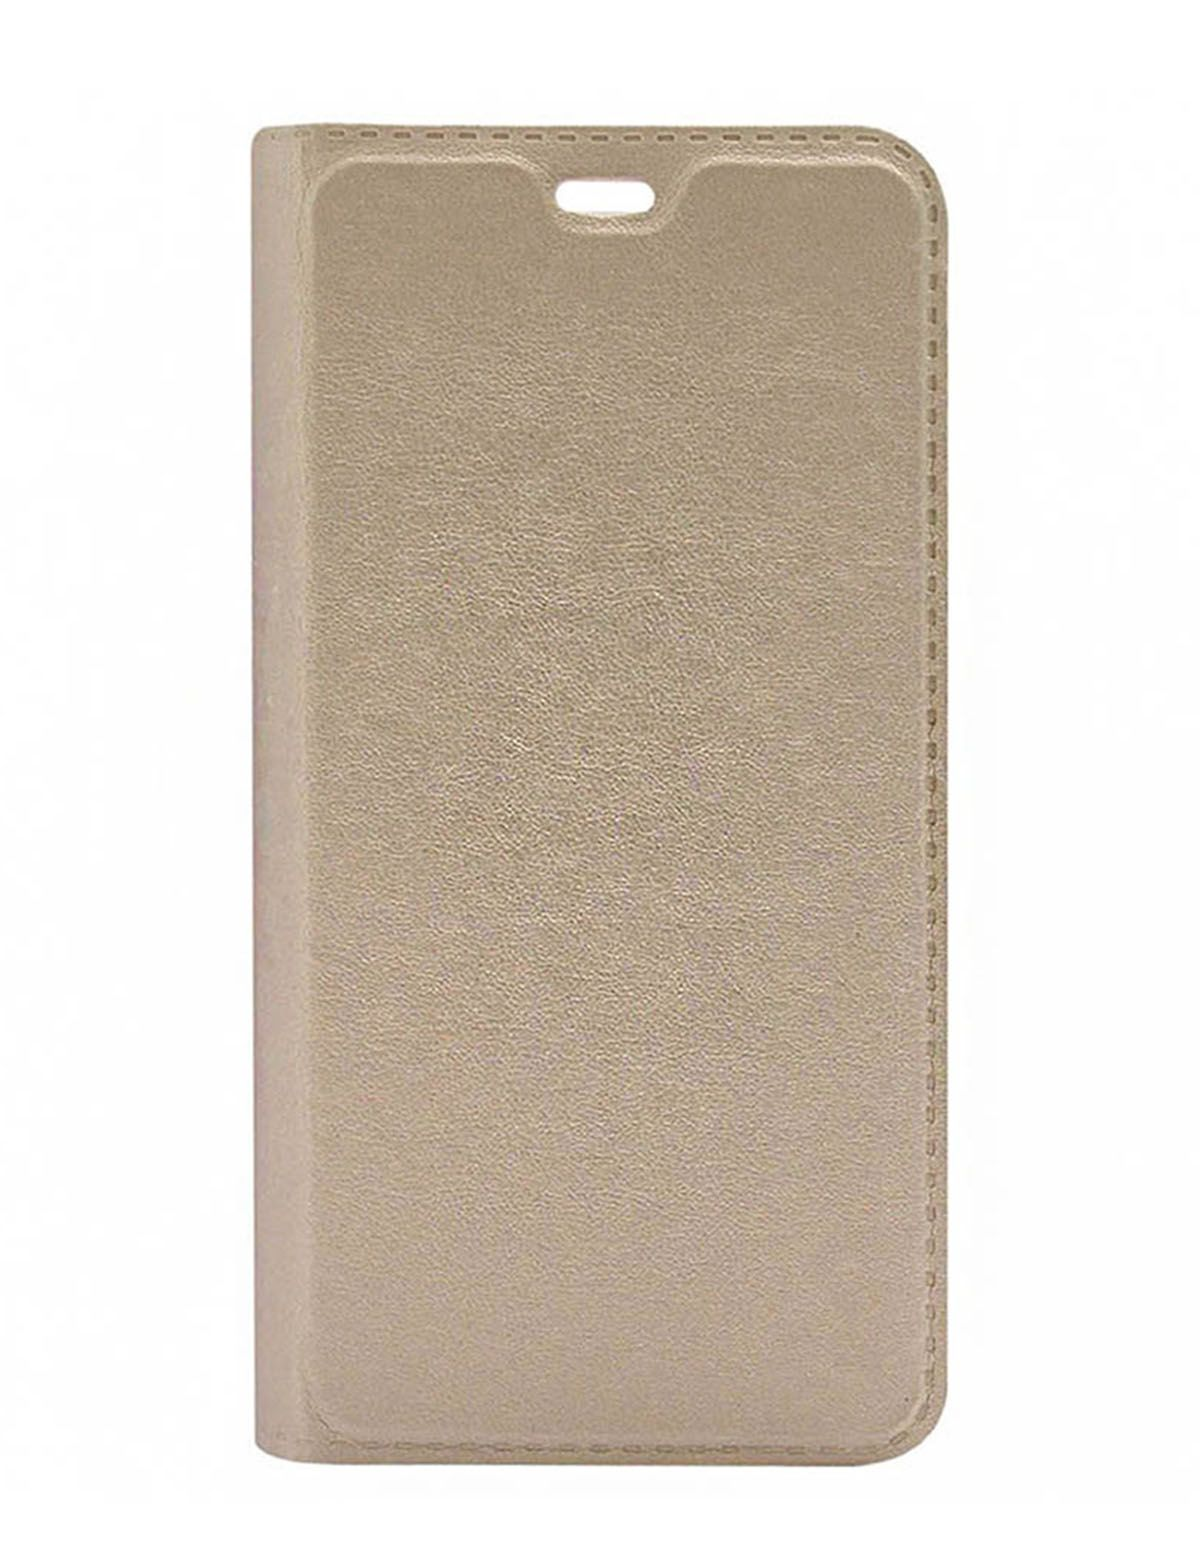 Samsung Galaxy S6 Edge Flip Cover by DDF - Golden